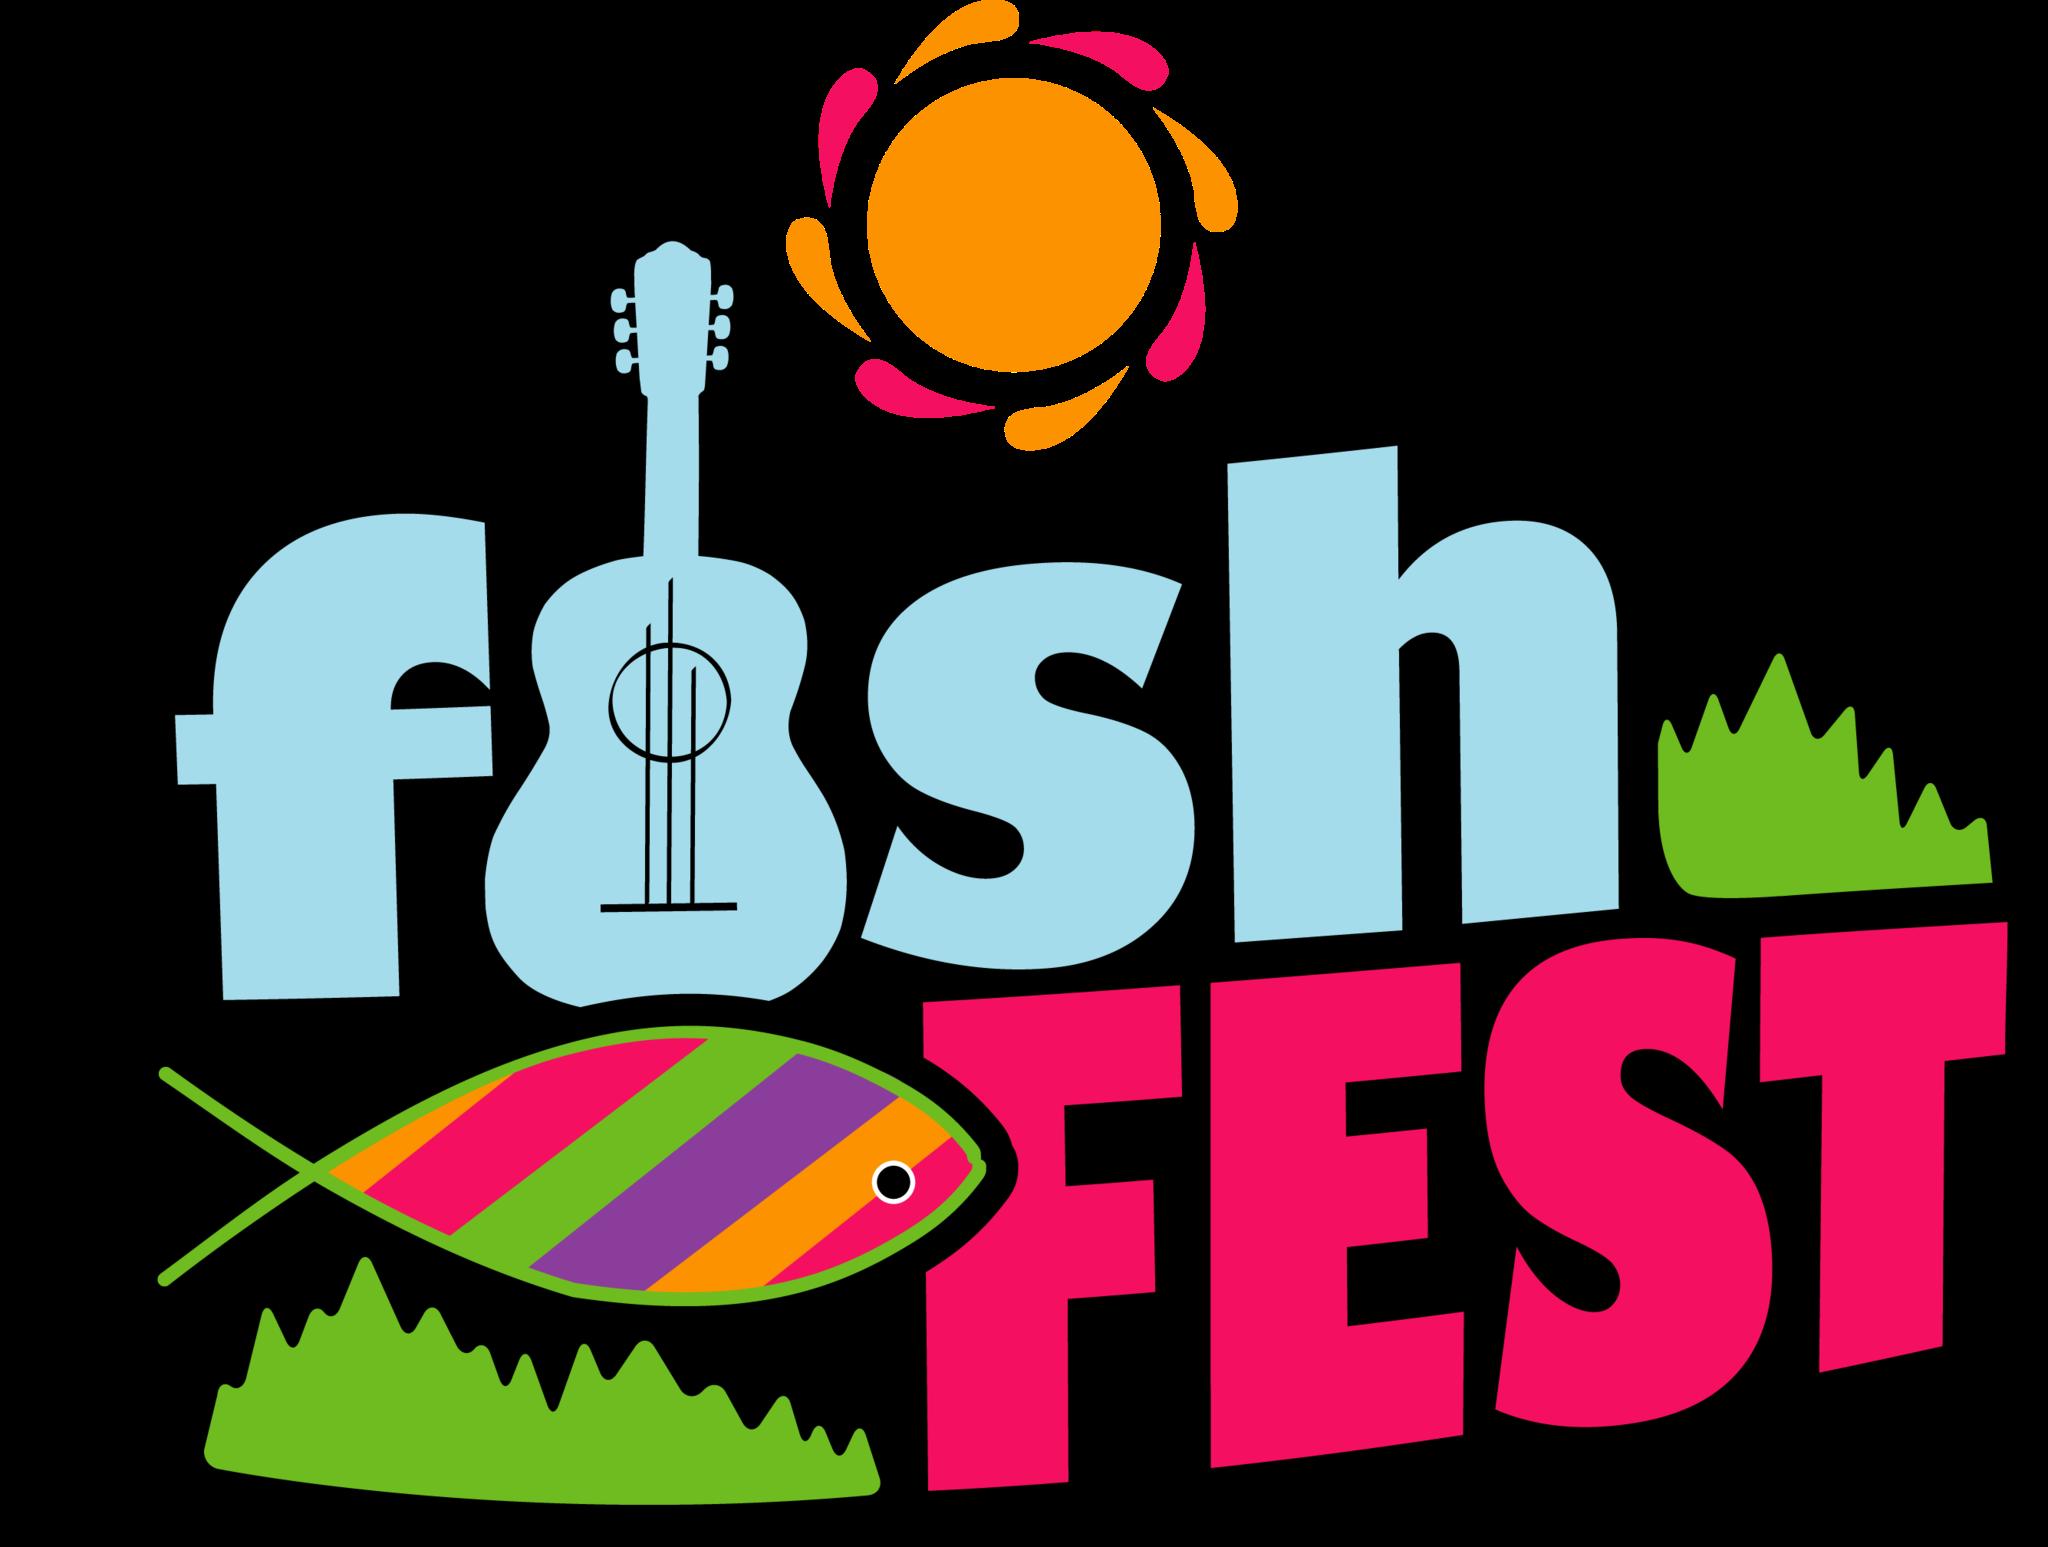 Collaboration clipart distant. Tobymac kutless fish fest